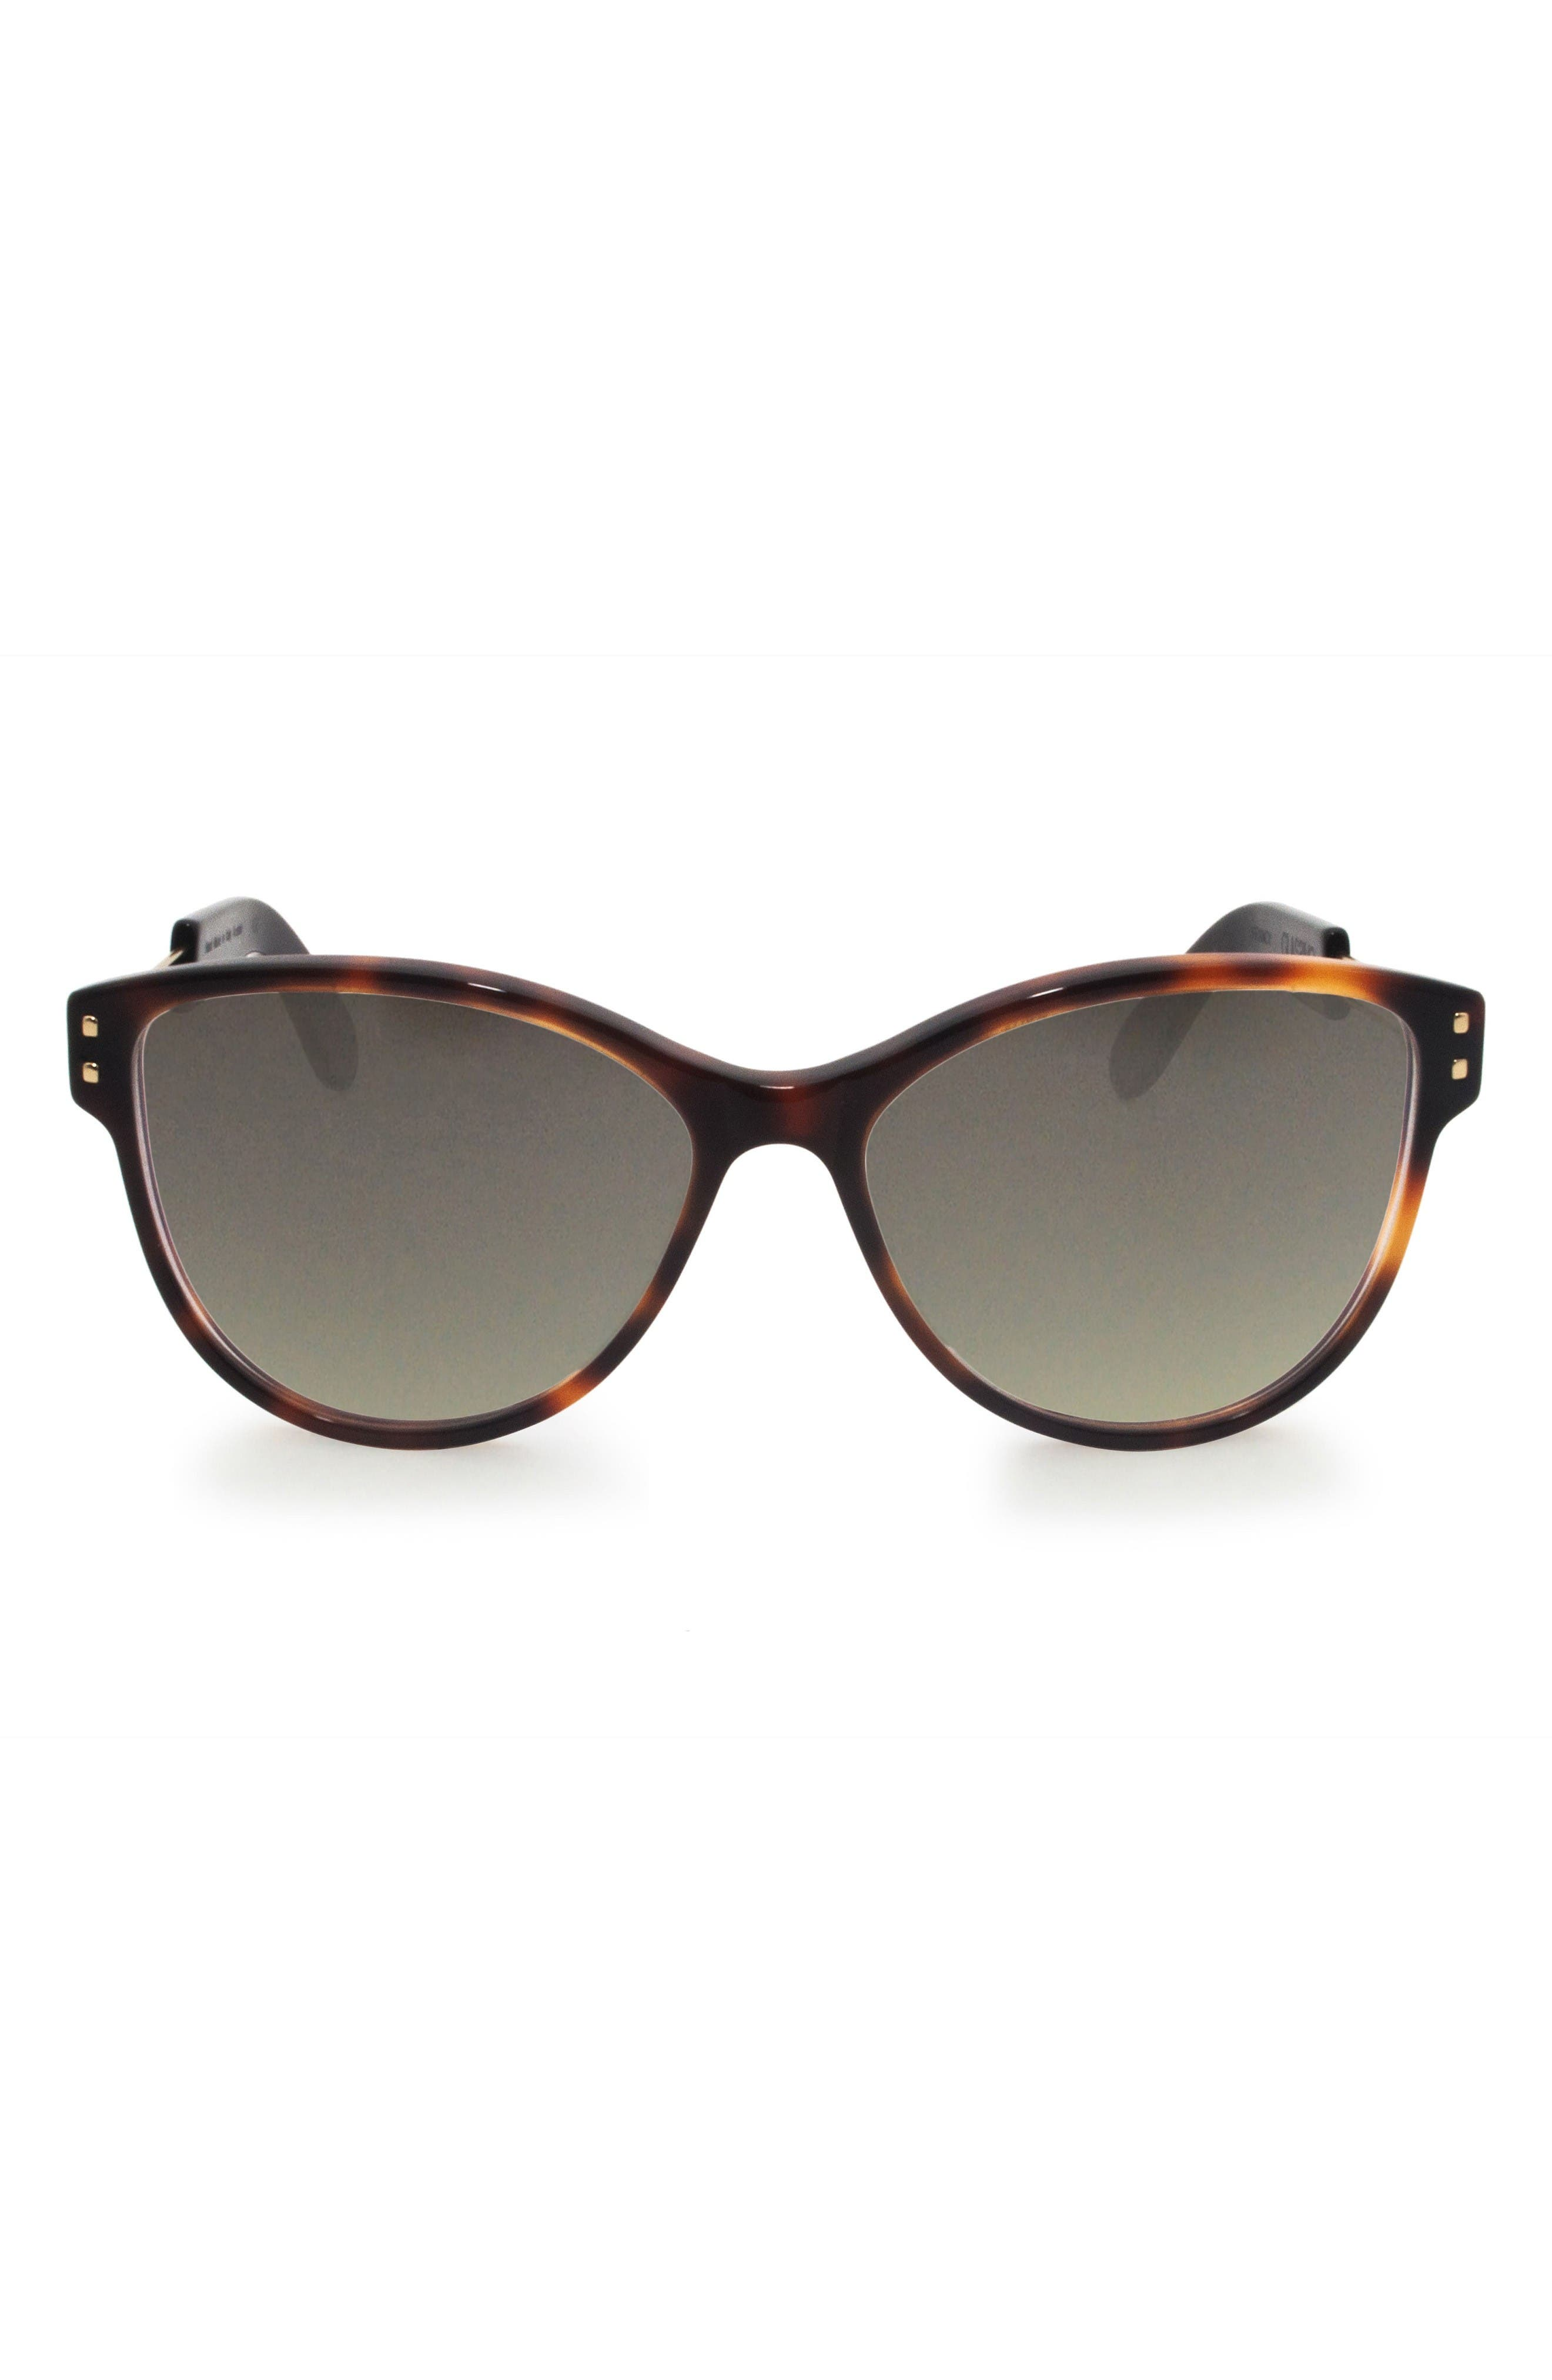 Alternate Image 1 Selected - GLASSING Francy 56mm Gradient Cat Eye Sunglasses